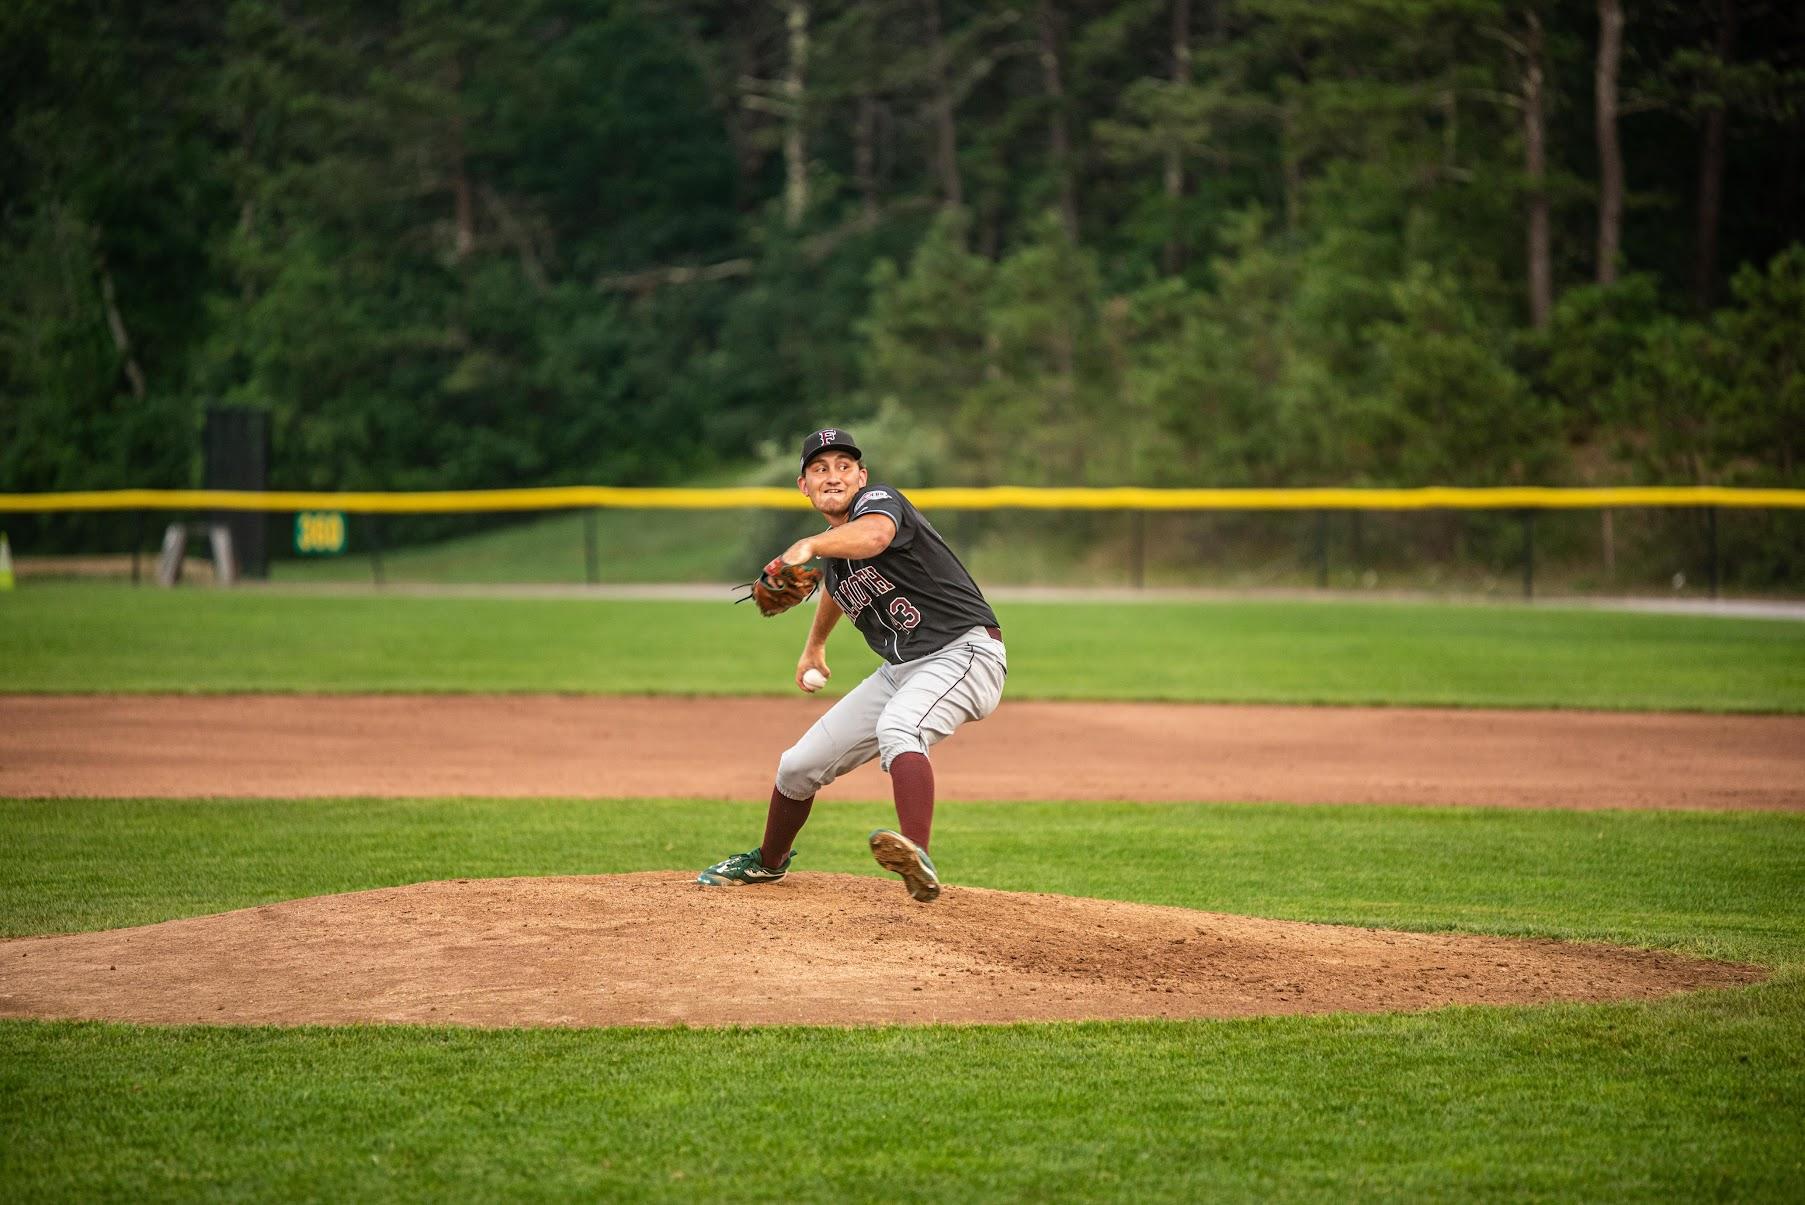 Jack Jasiak pitching